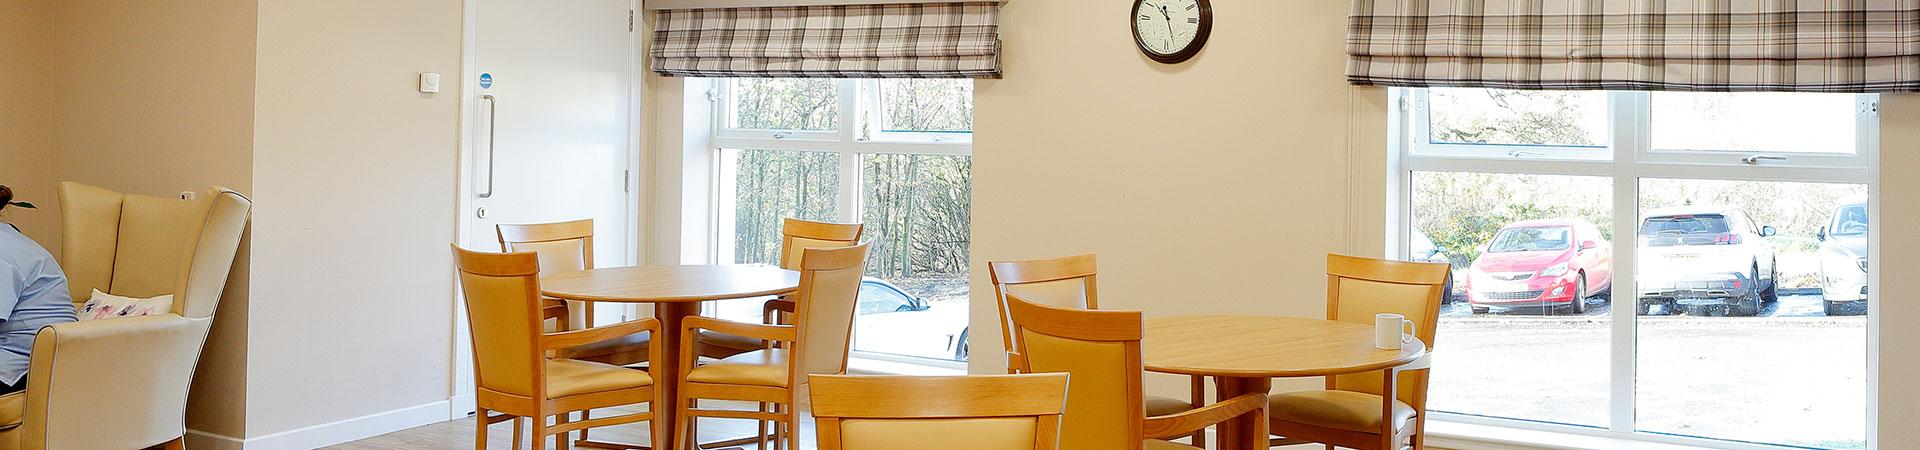 Rosehall Care Home, Shotts, North Lanarkshire